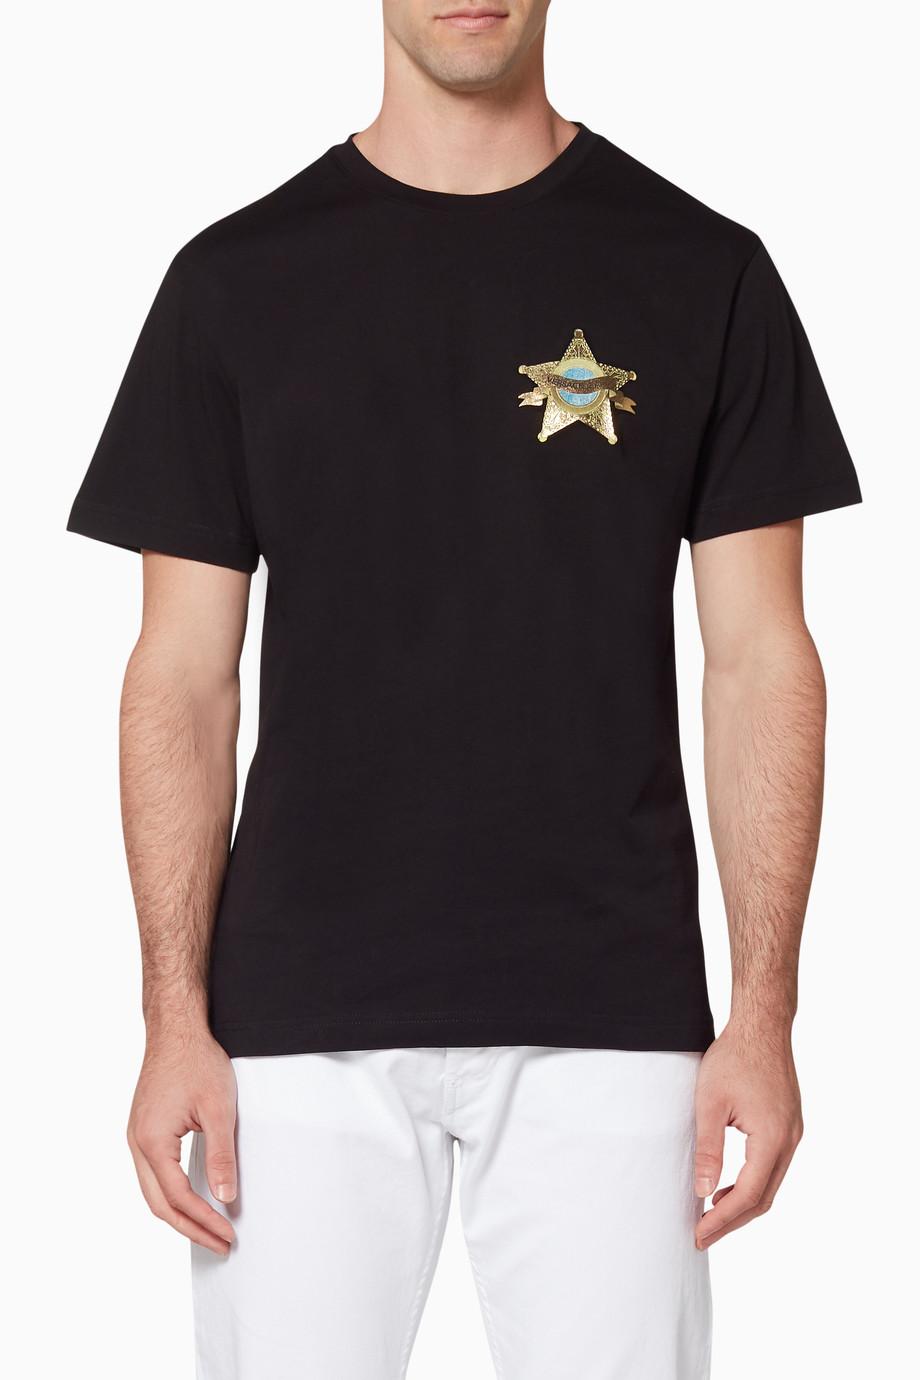 b8a4b6da9 Shop Versace Jeans Black Black Foil Star Logo T-Shirt for Men ...